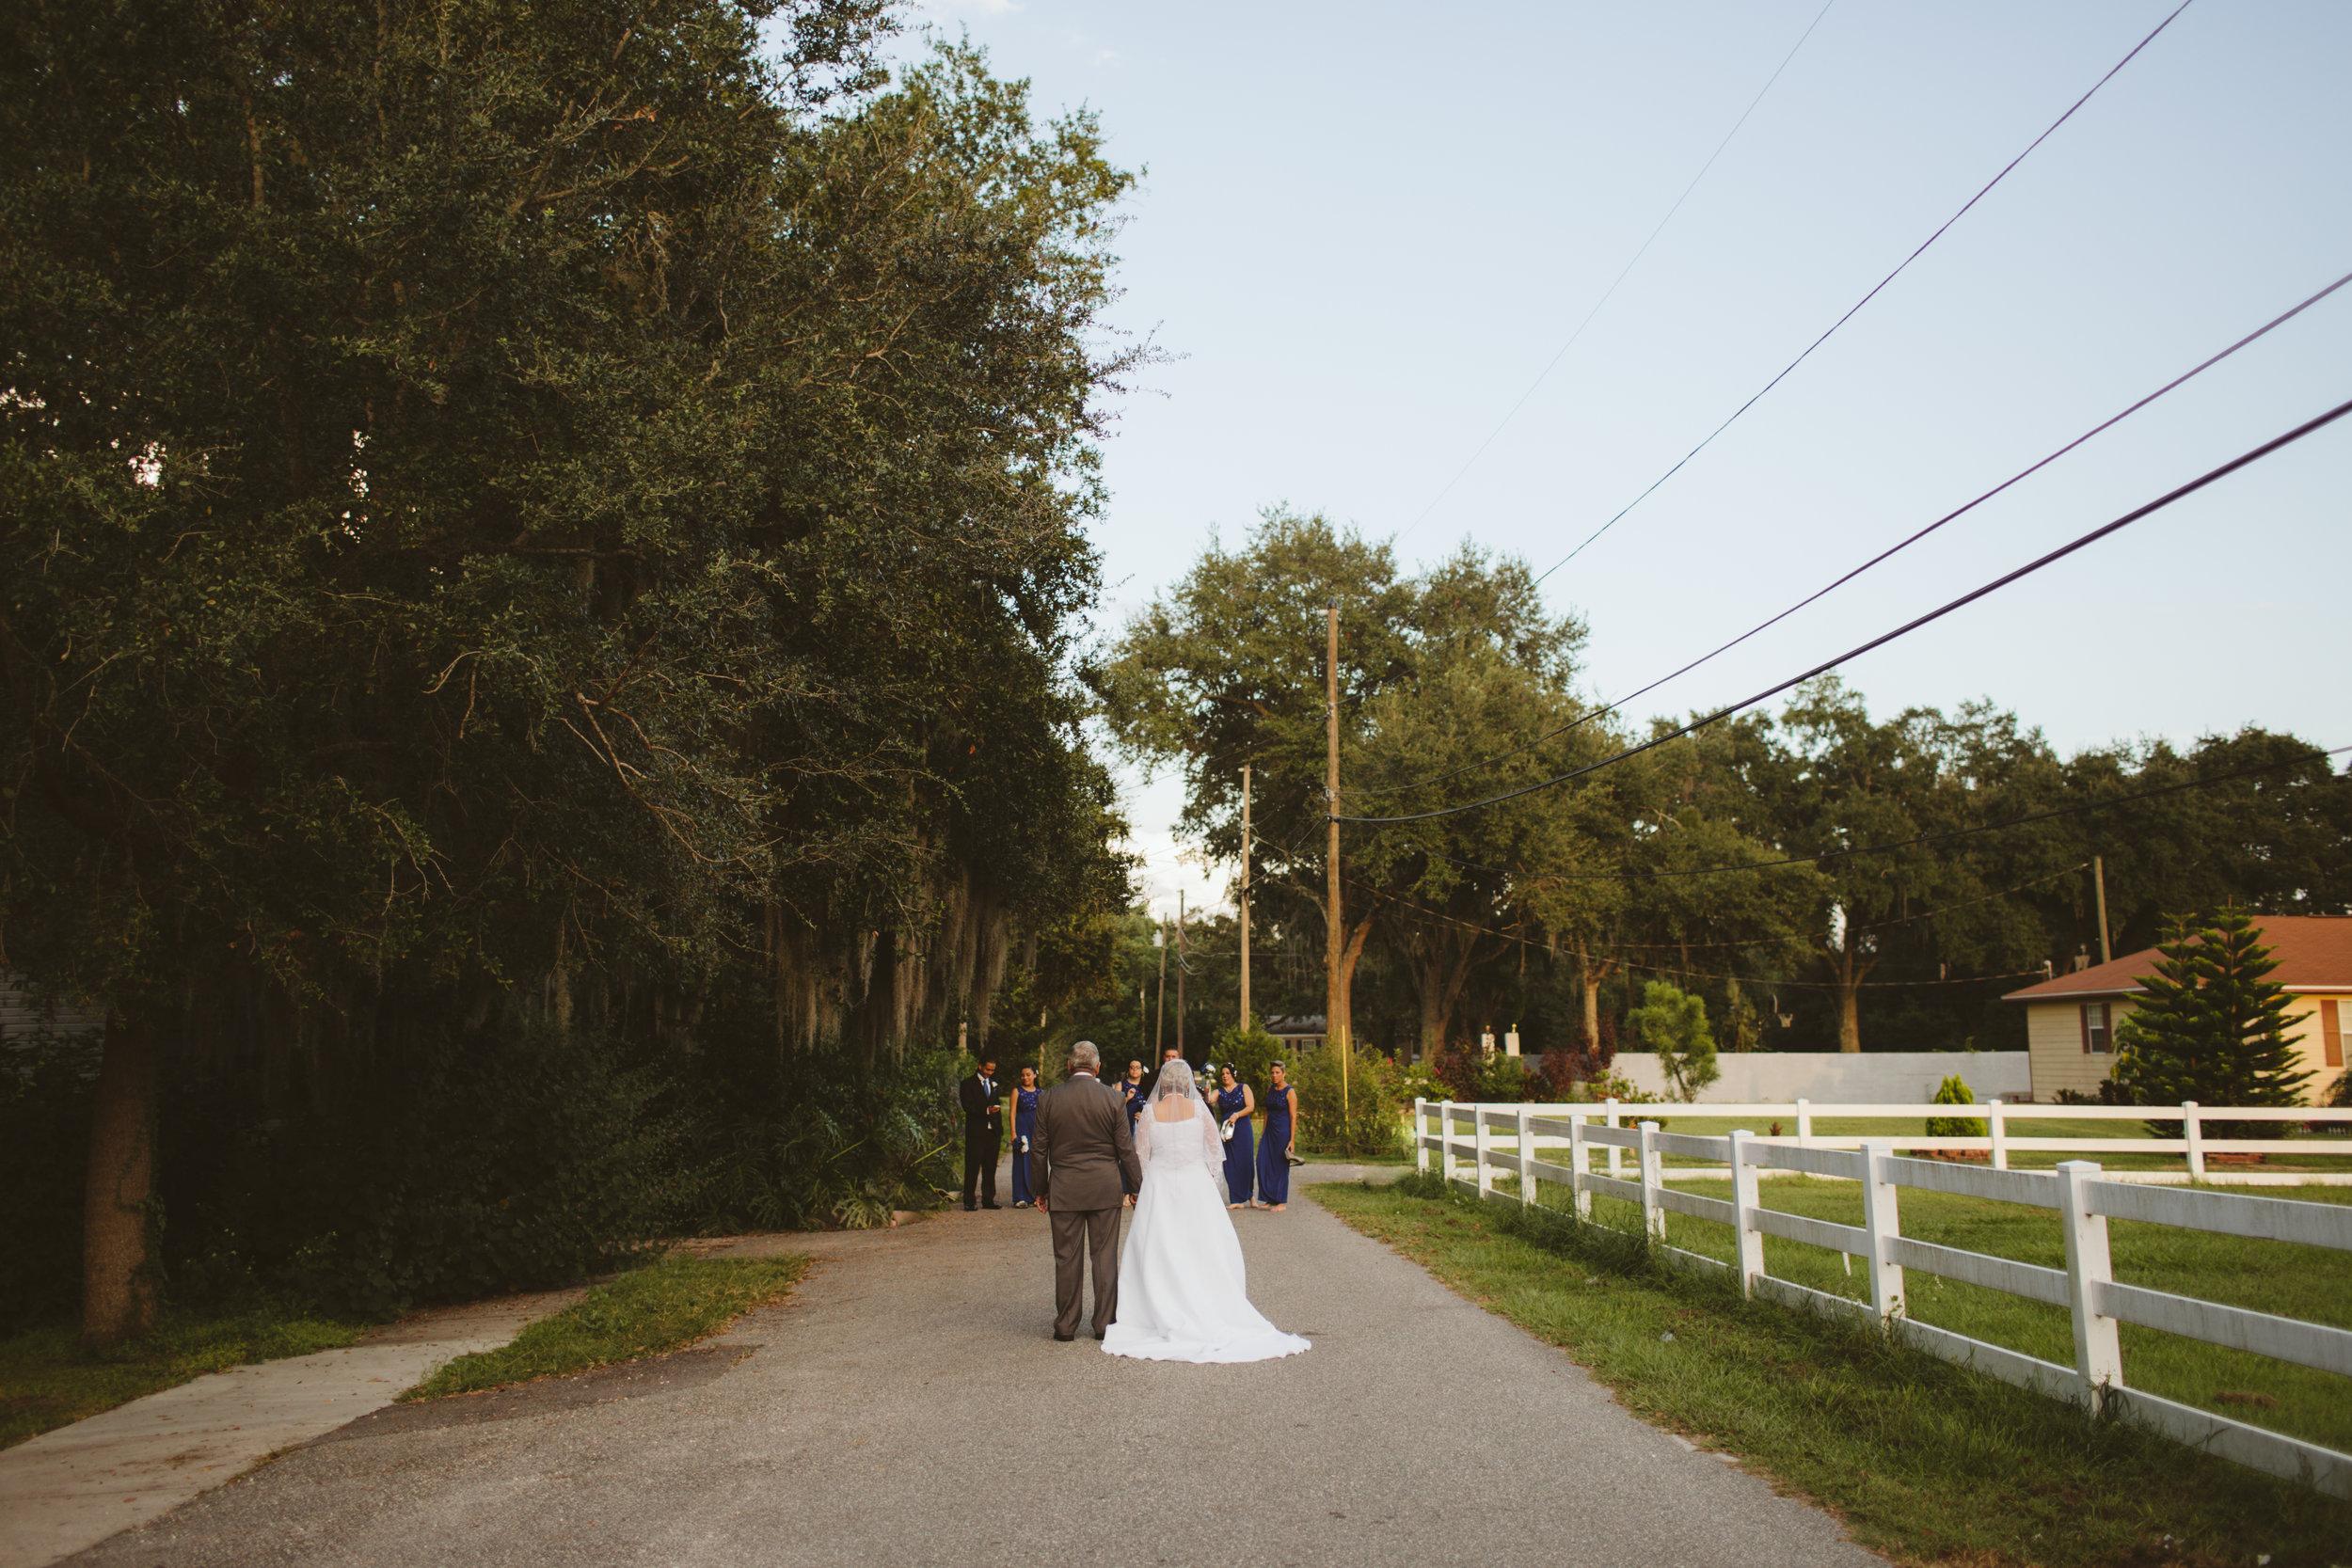 wedding | Vanessa Boy Photography | vanessaboy.com |-223.jpg